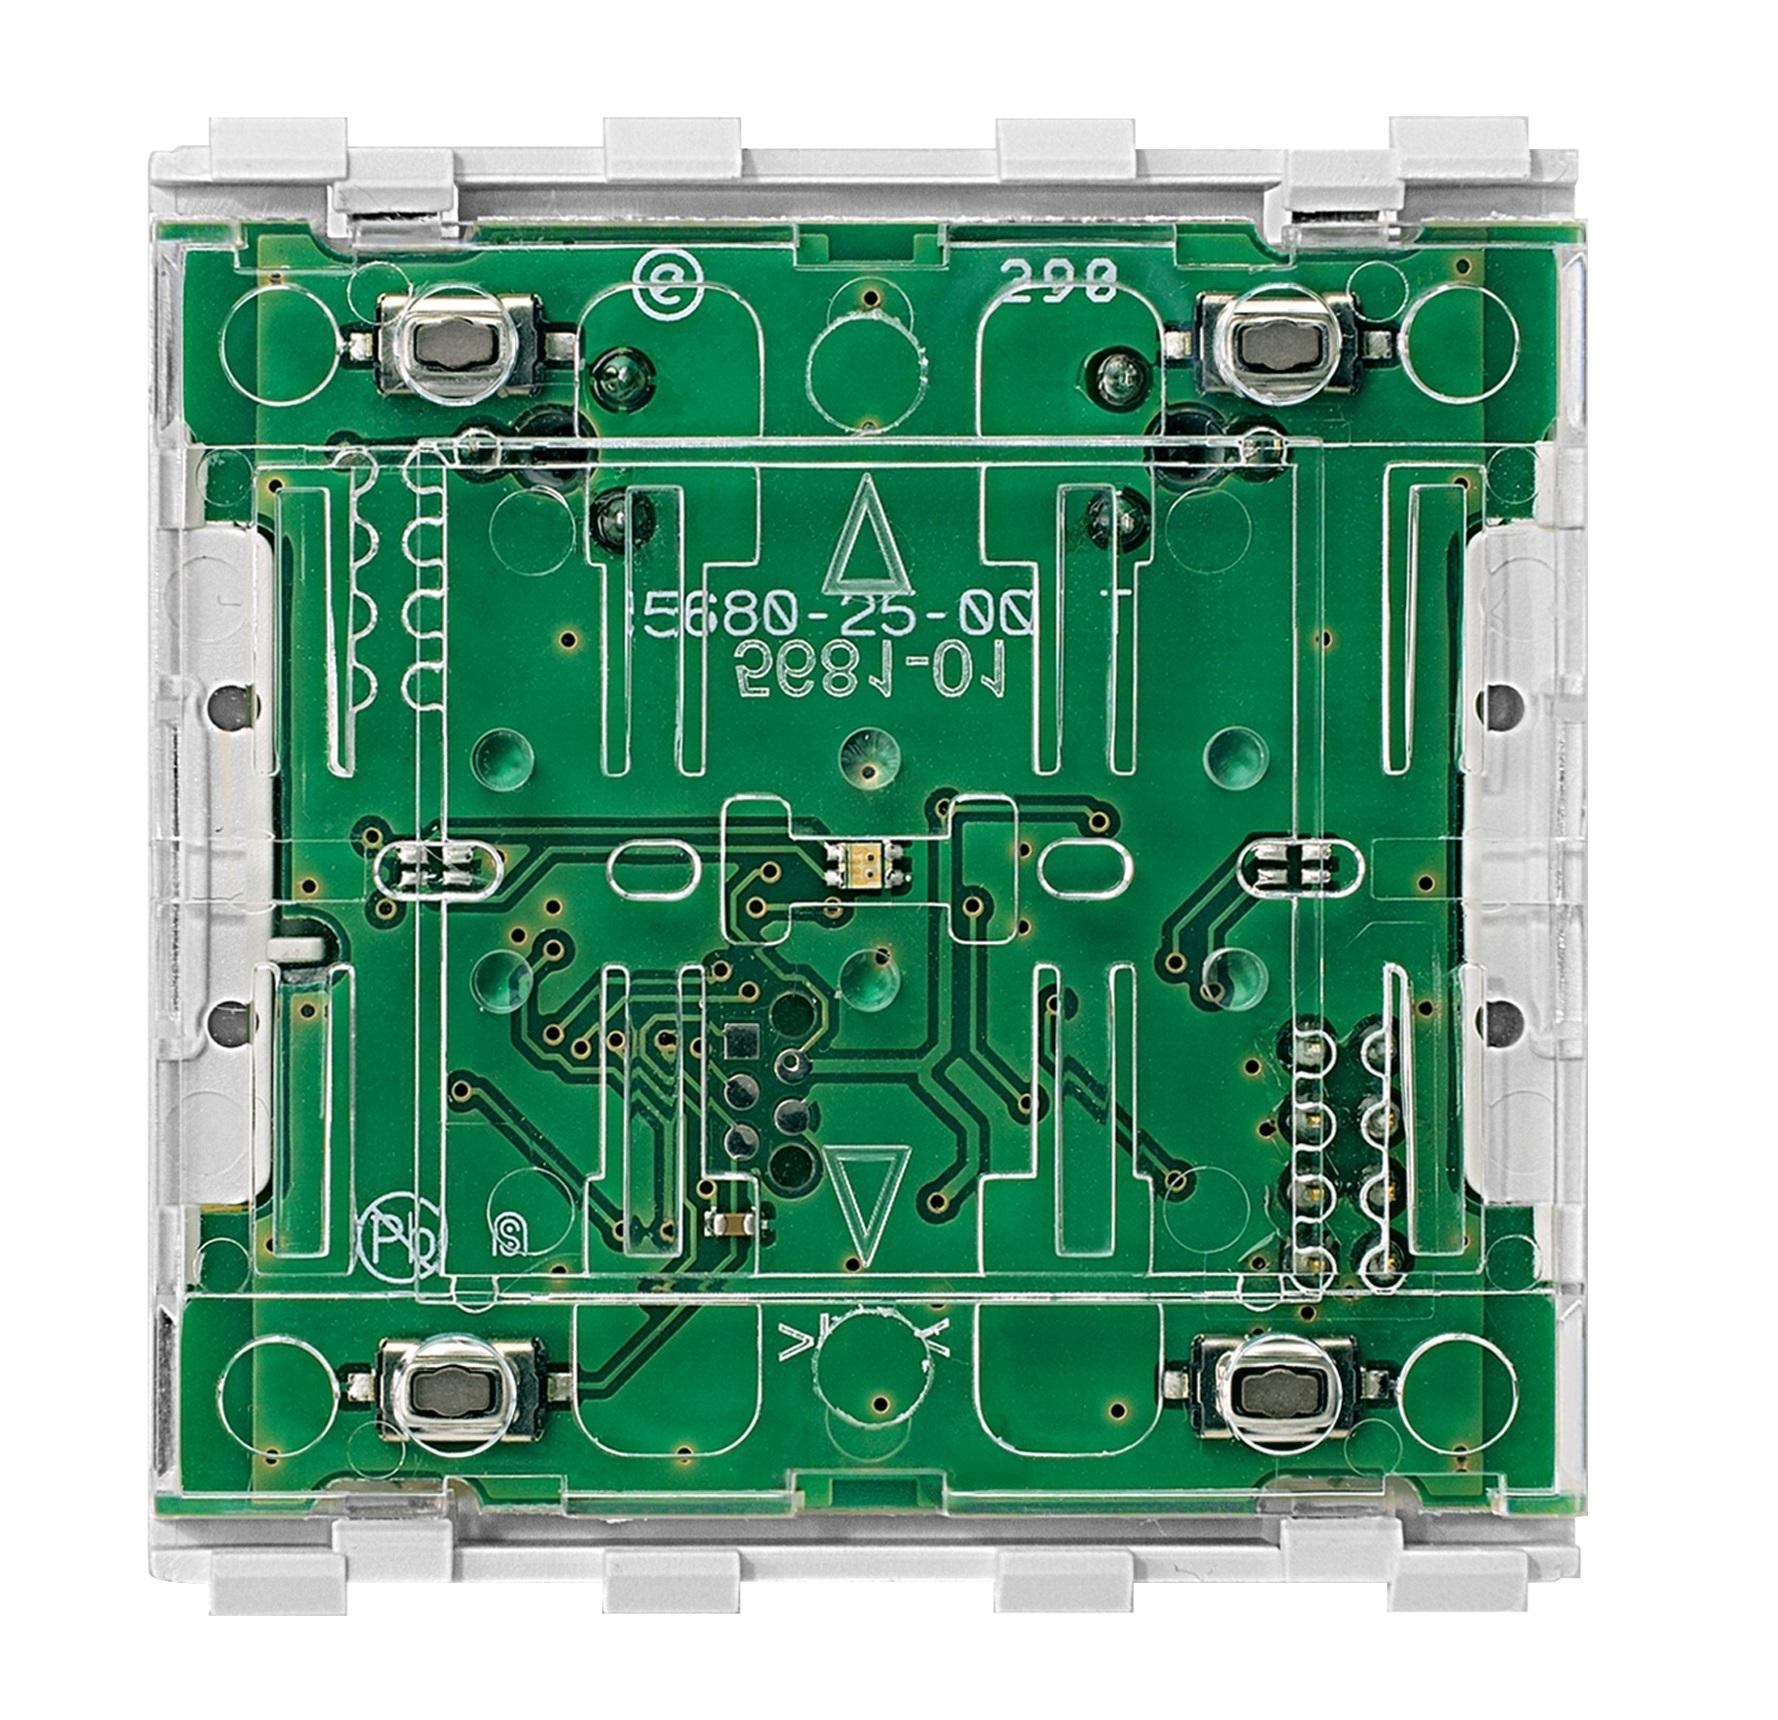 1 Stk Taster-Modul Basic, 1-fach EV51100300